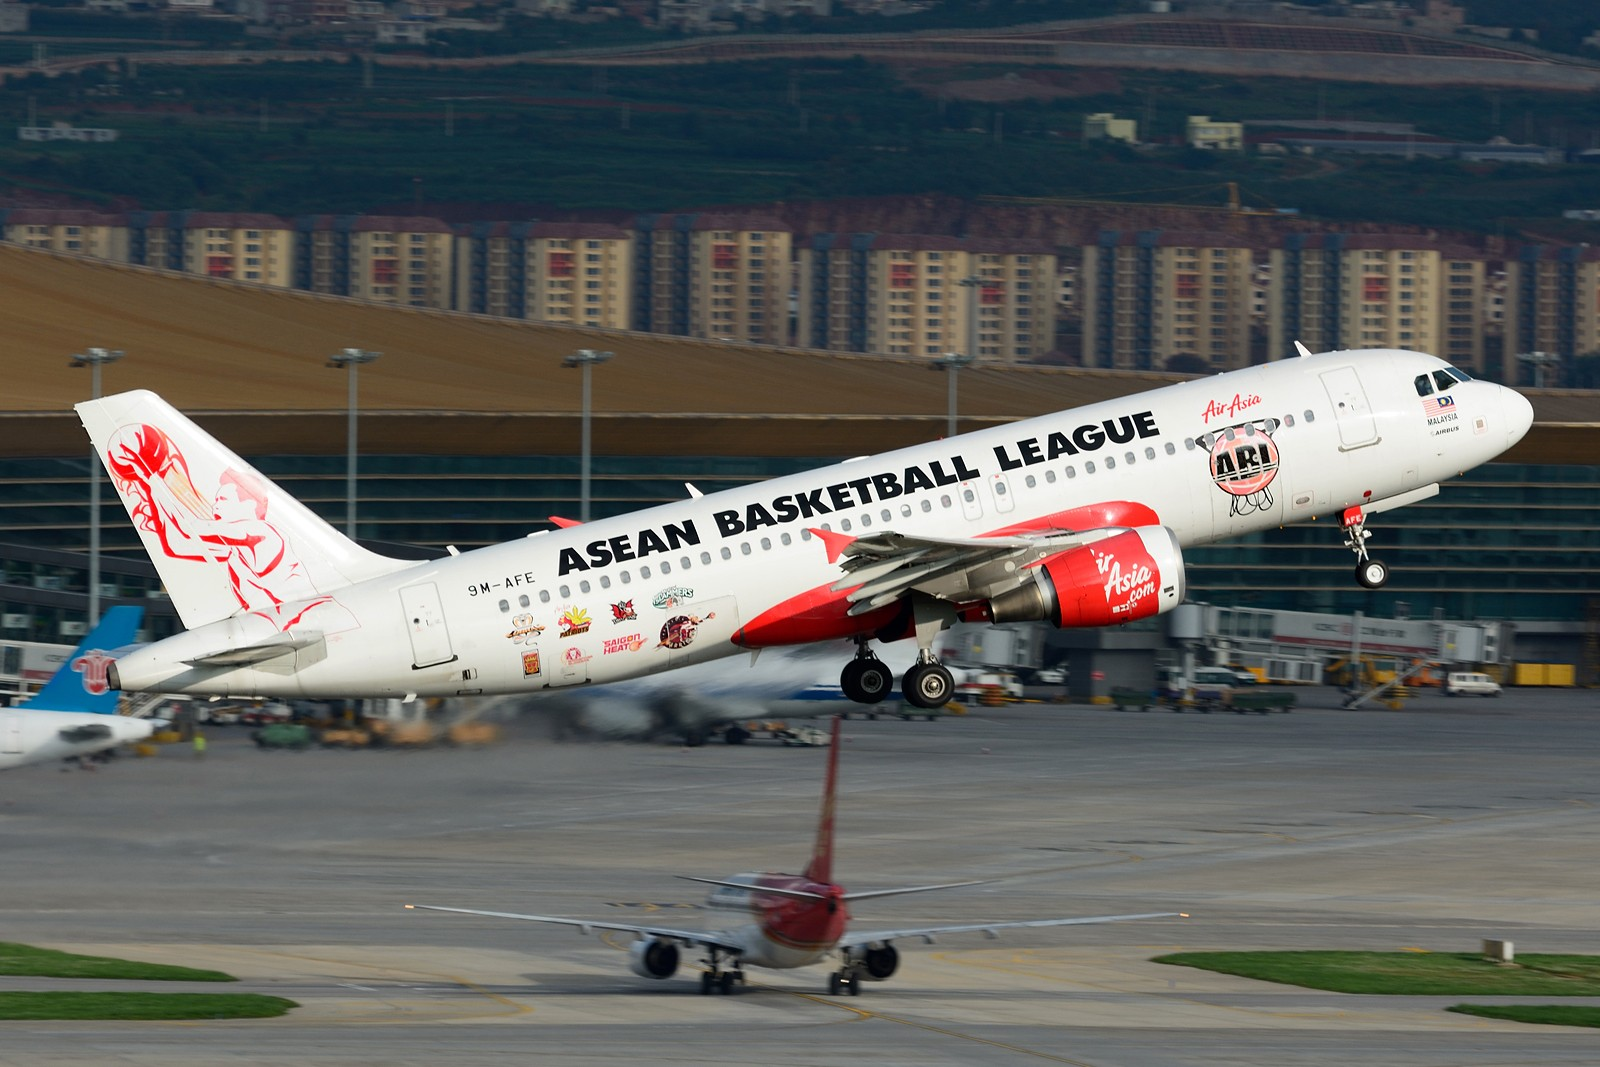 Re:[原创]太珍贵了,估计是坛子里首发,喜马拉雅山脚下的小国不丹航空,土耳其第300架纪念涂装,三大联盟涂装一下午全部抓到,新加坡樟宜机场好货多多 AIRBUS A320-200 9M-AFE 中国昆明长水国际机场